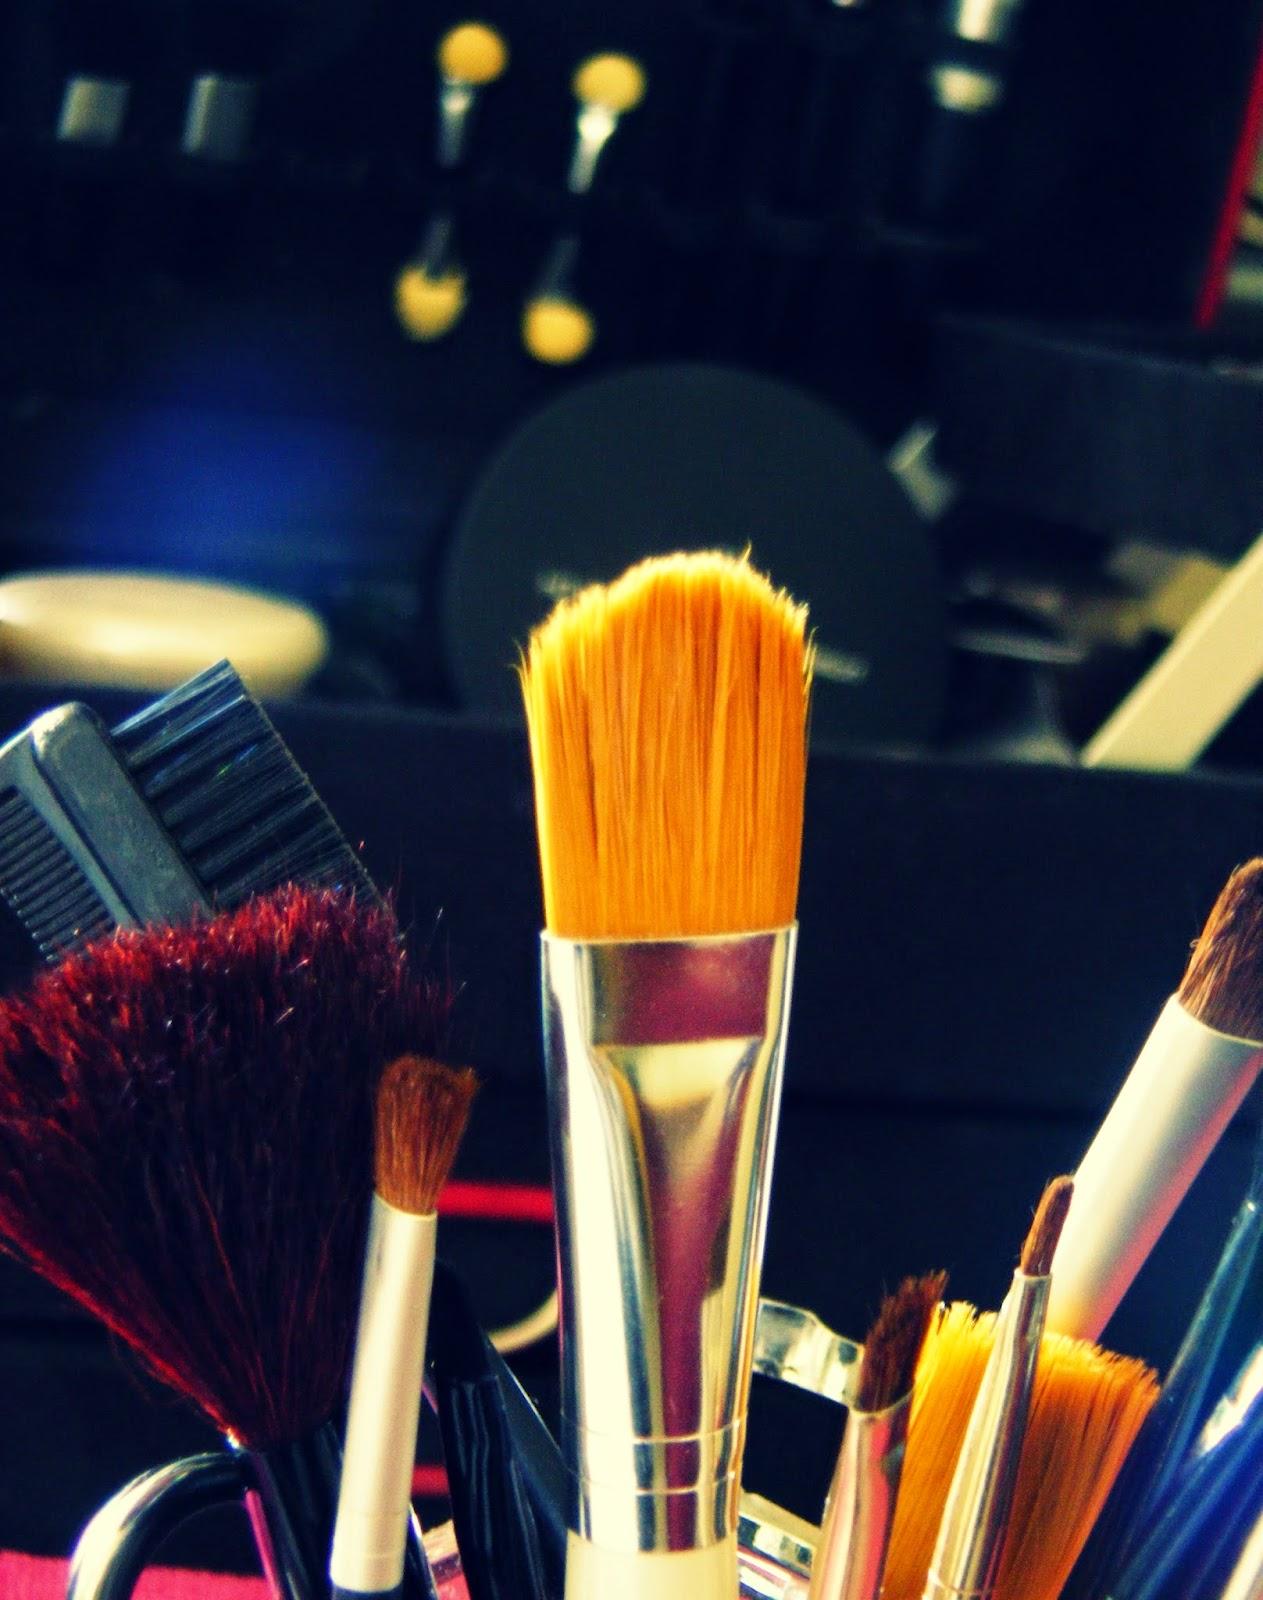 http://outfitdeldia.blogspot.com/2015/01/el-cuidado-de-tus-brochas-de-maquillaje.html